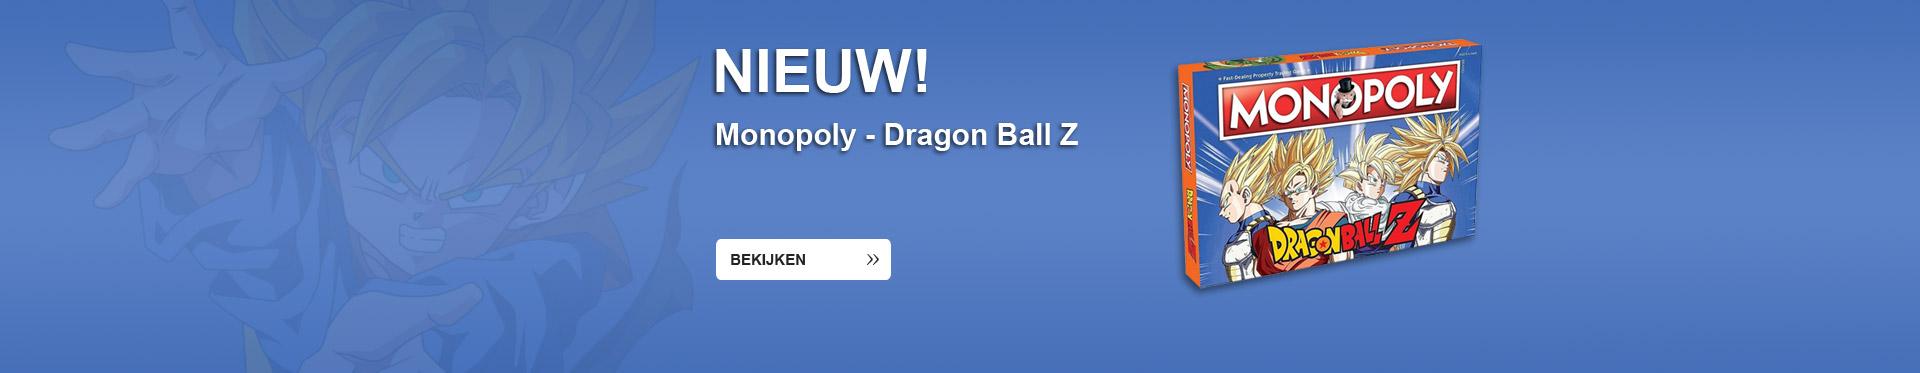 Home  Gezelschapsspellen  Monopoly Monopoly Dragon Ball Z